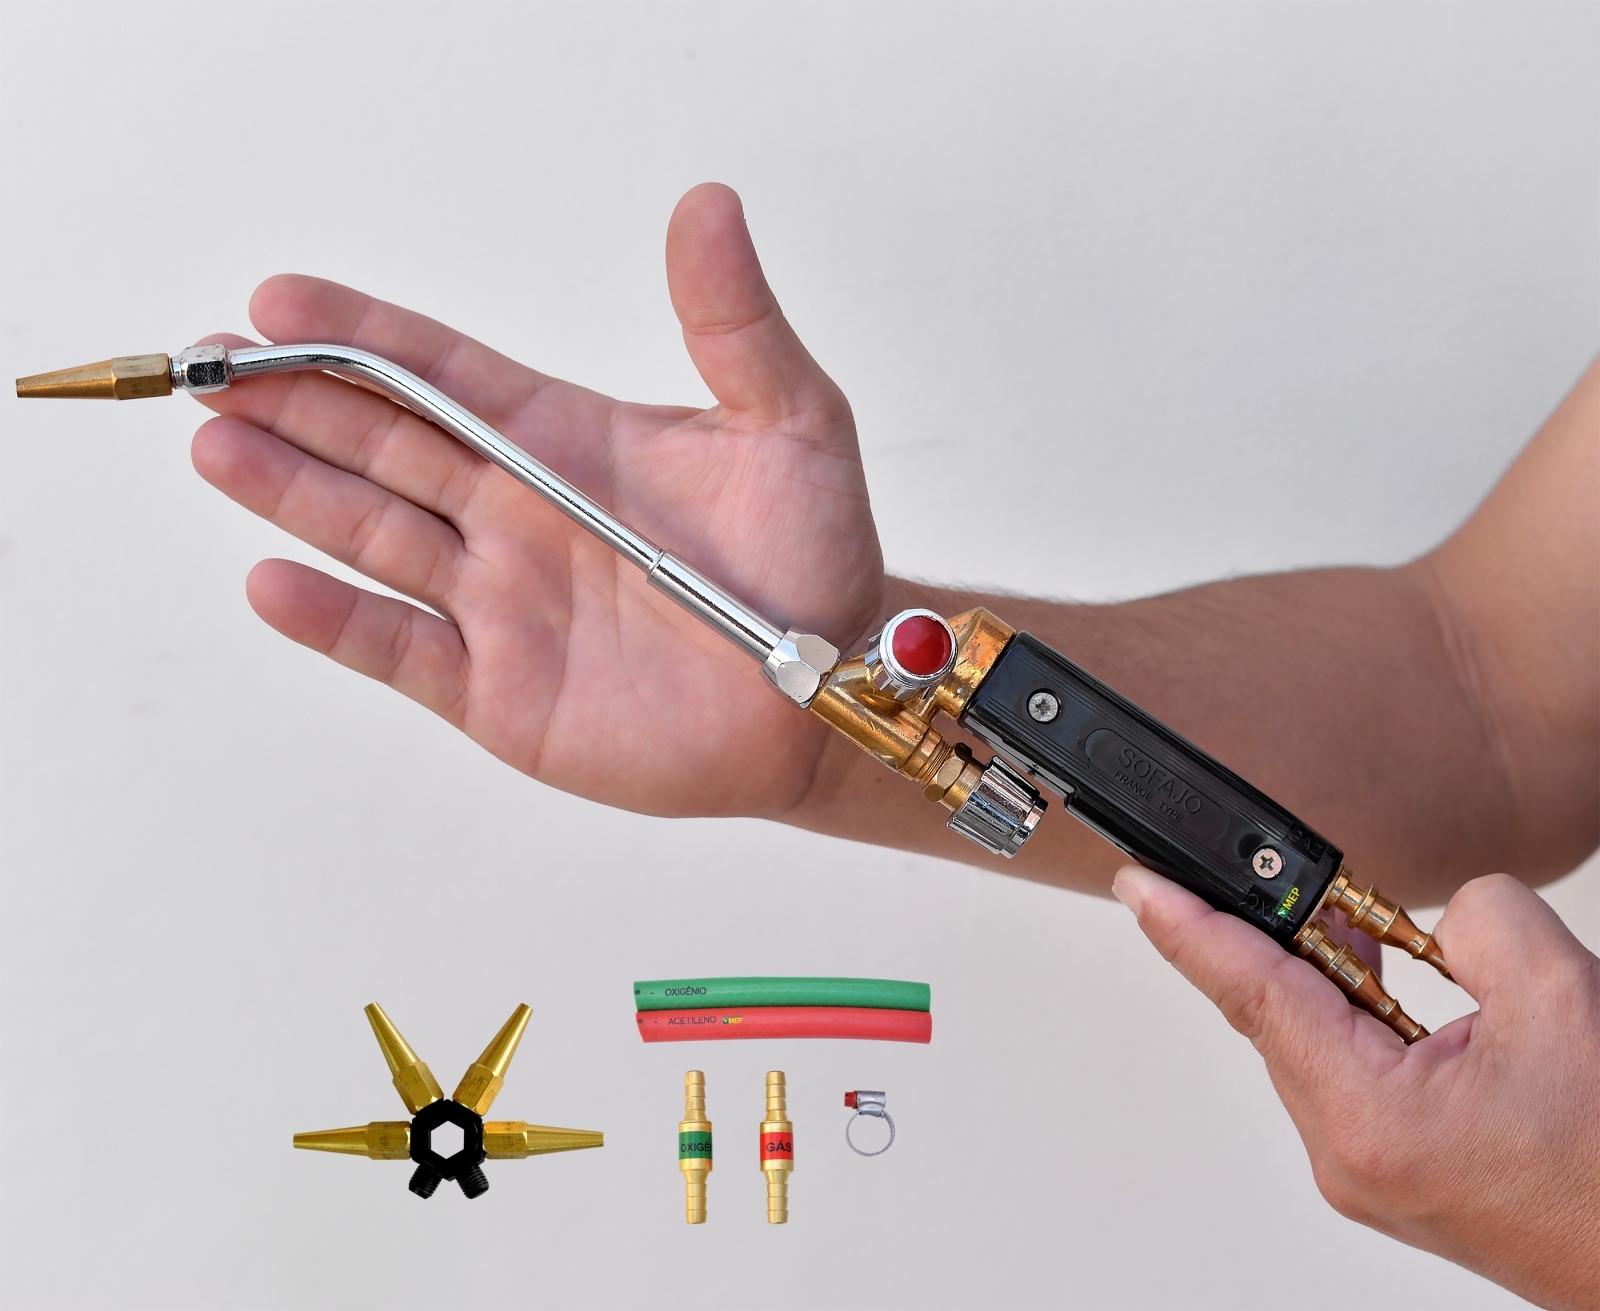 Maçarico Solda Ourives Artesanato Joia Protético Micro Cobre - Sf6 - Ferramentas MEP